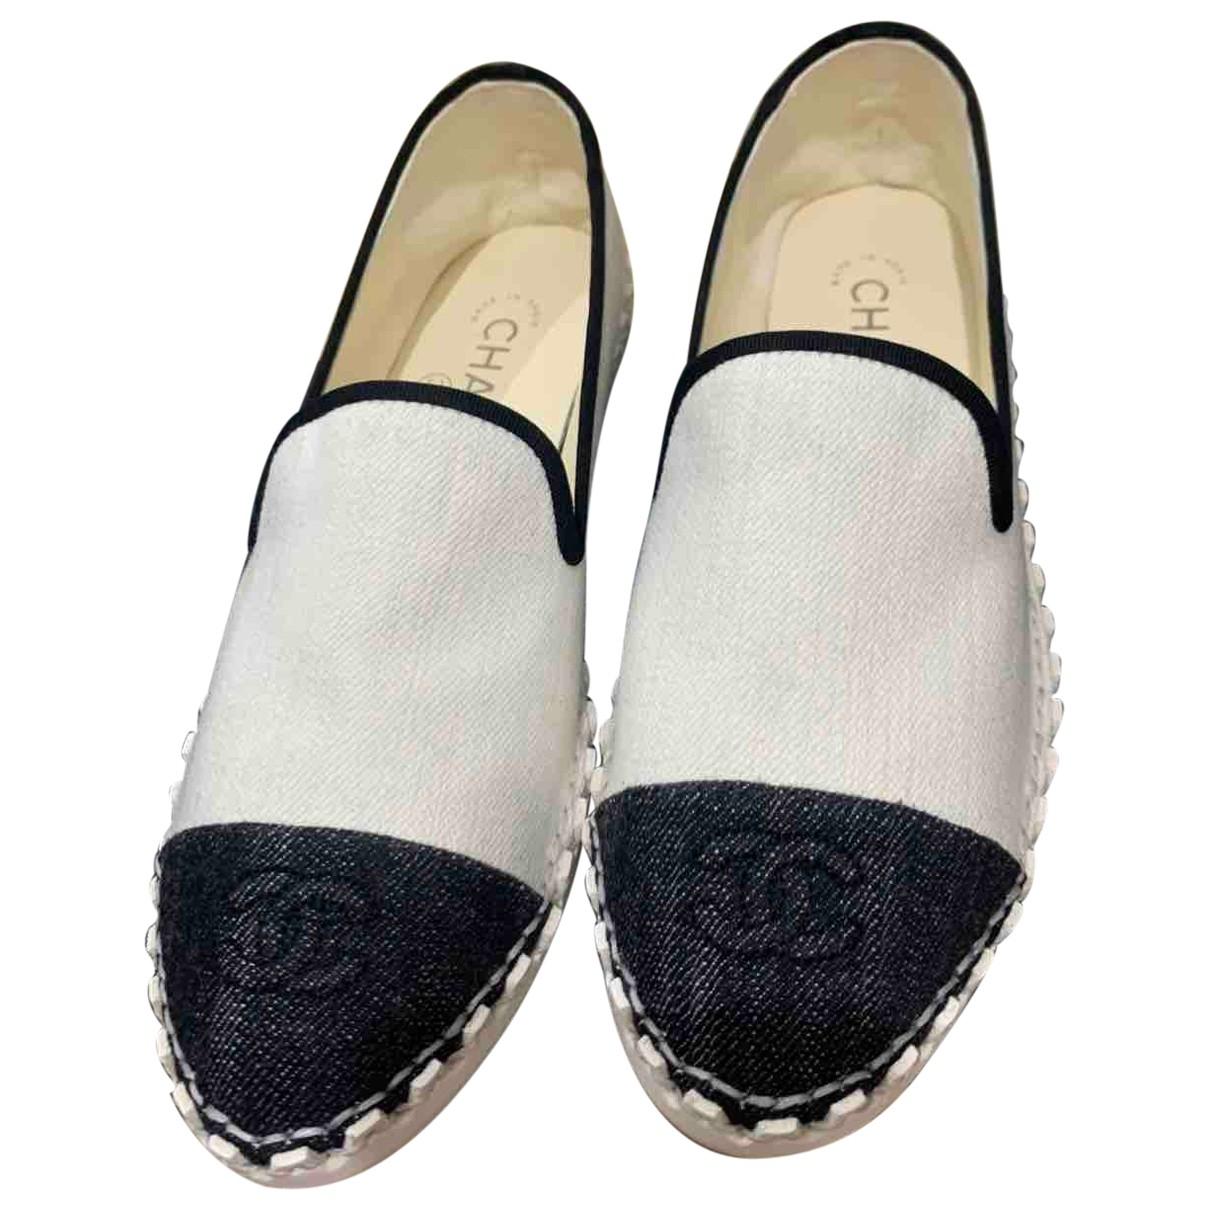 Chanel \N Espadrilles in  Weiss Denim - Jeans